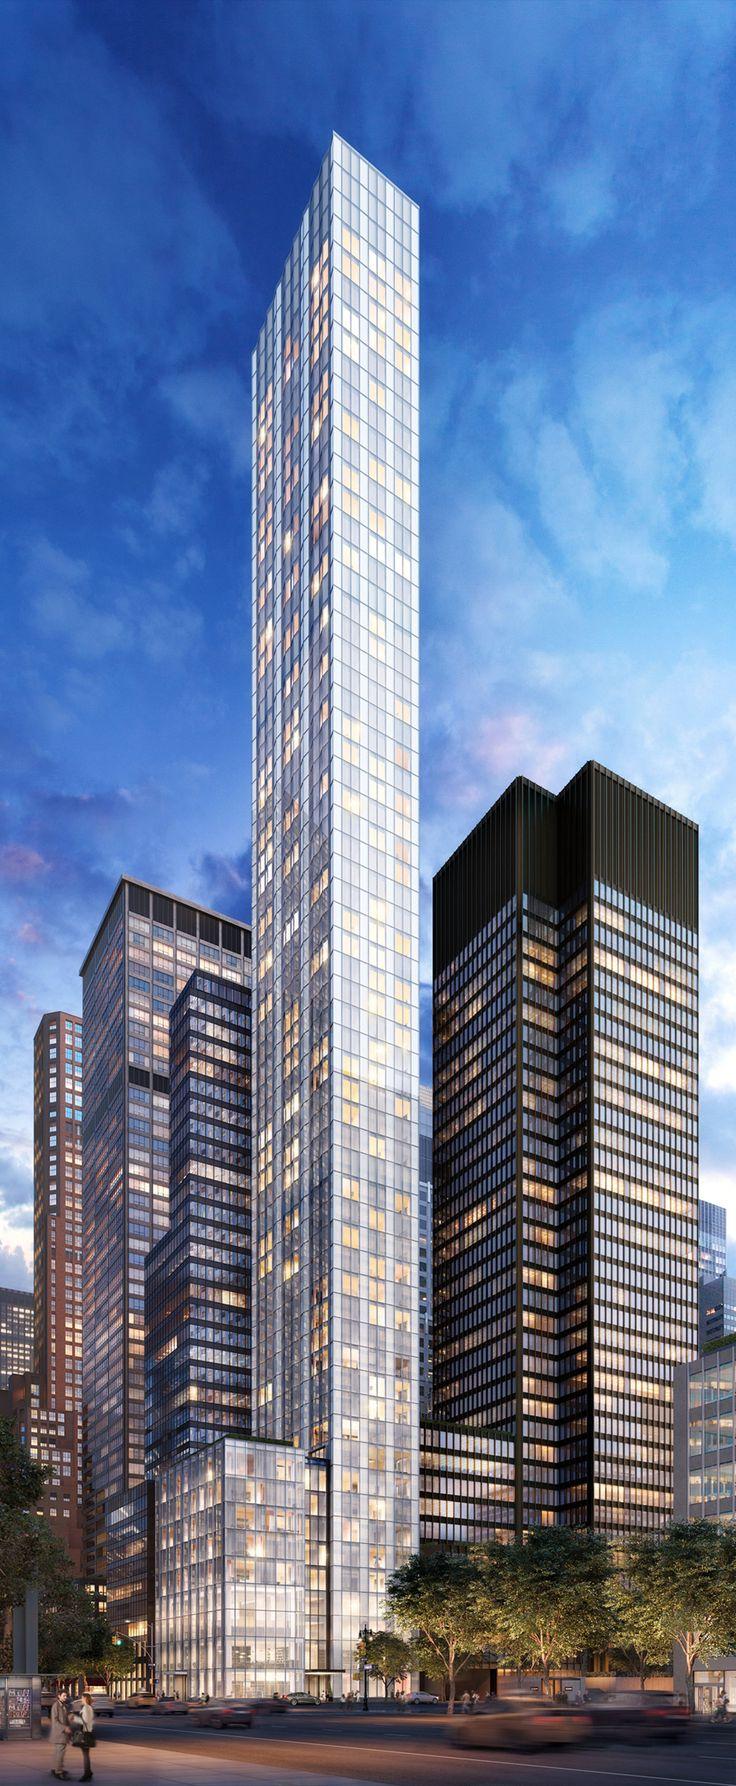 NEW YORK   610 Lexington Ave   712 FT / 216 M l 66 FLOORS - Page 11 - SkyscraperPage Forum